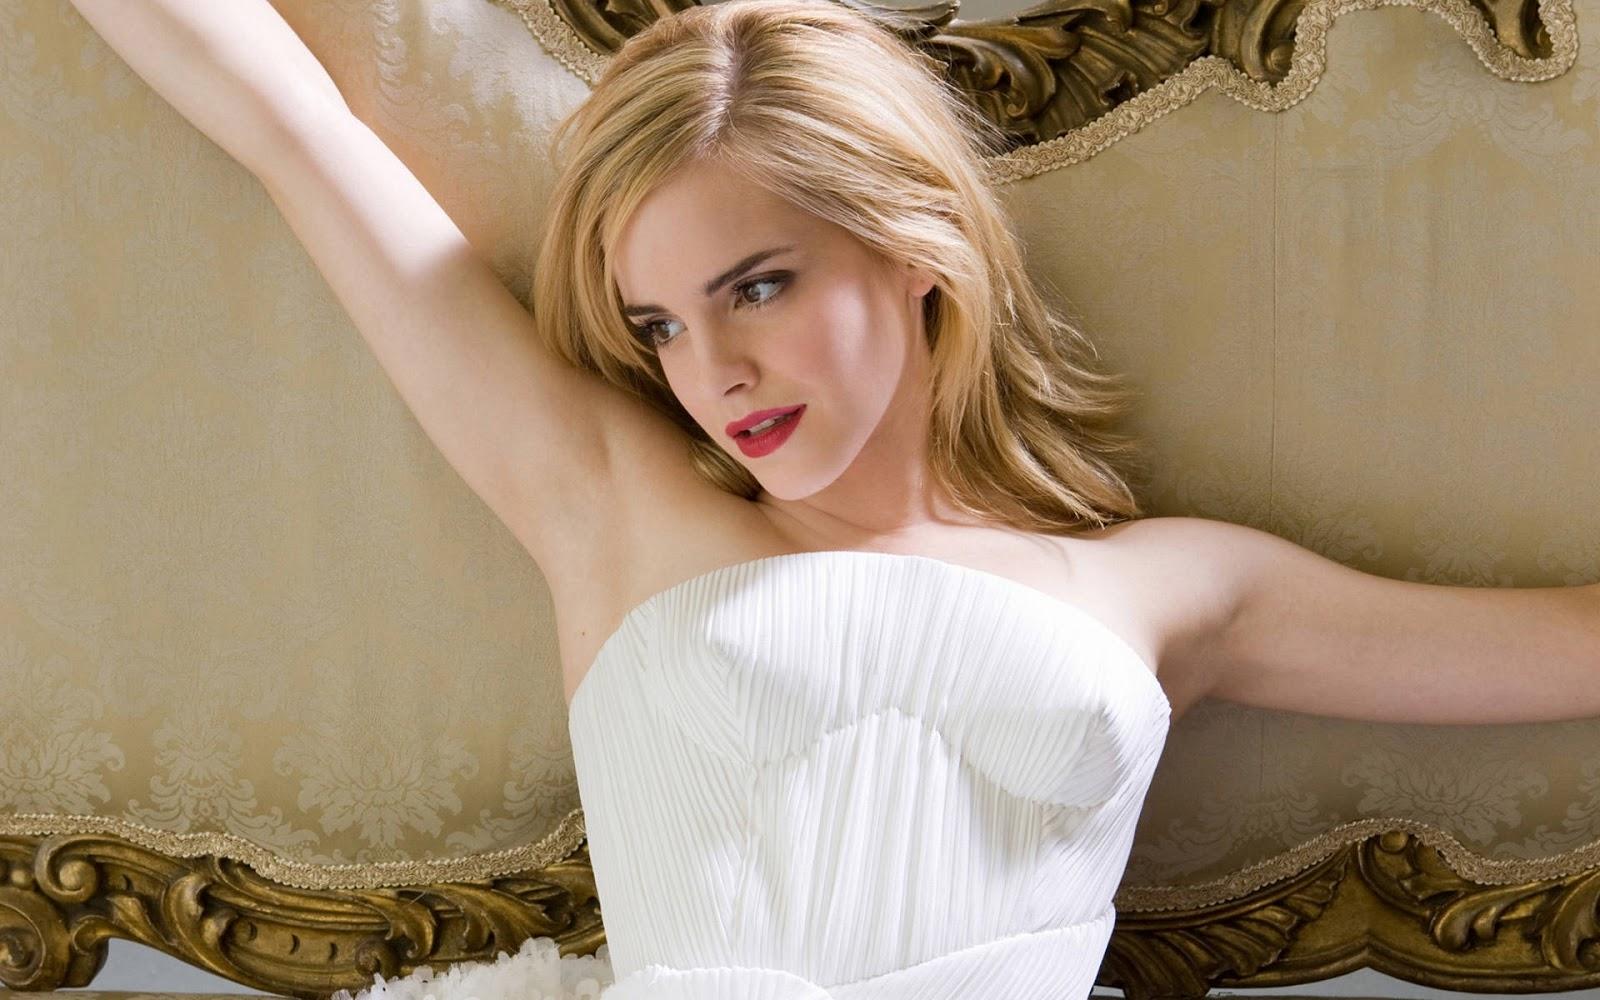 HD Images of Emma Watson